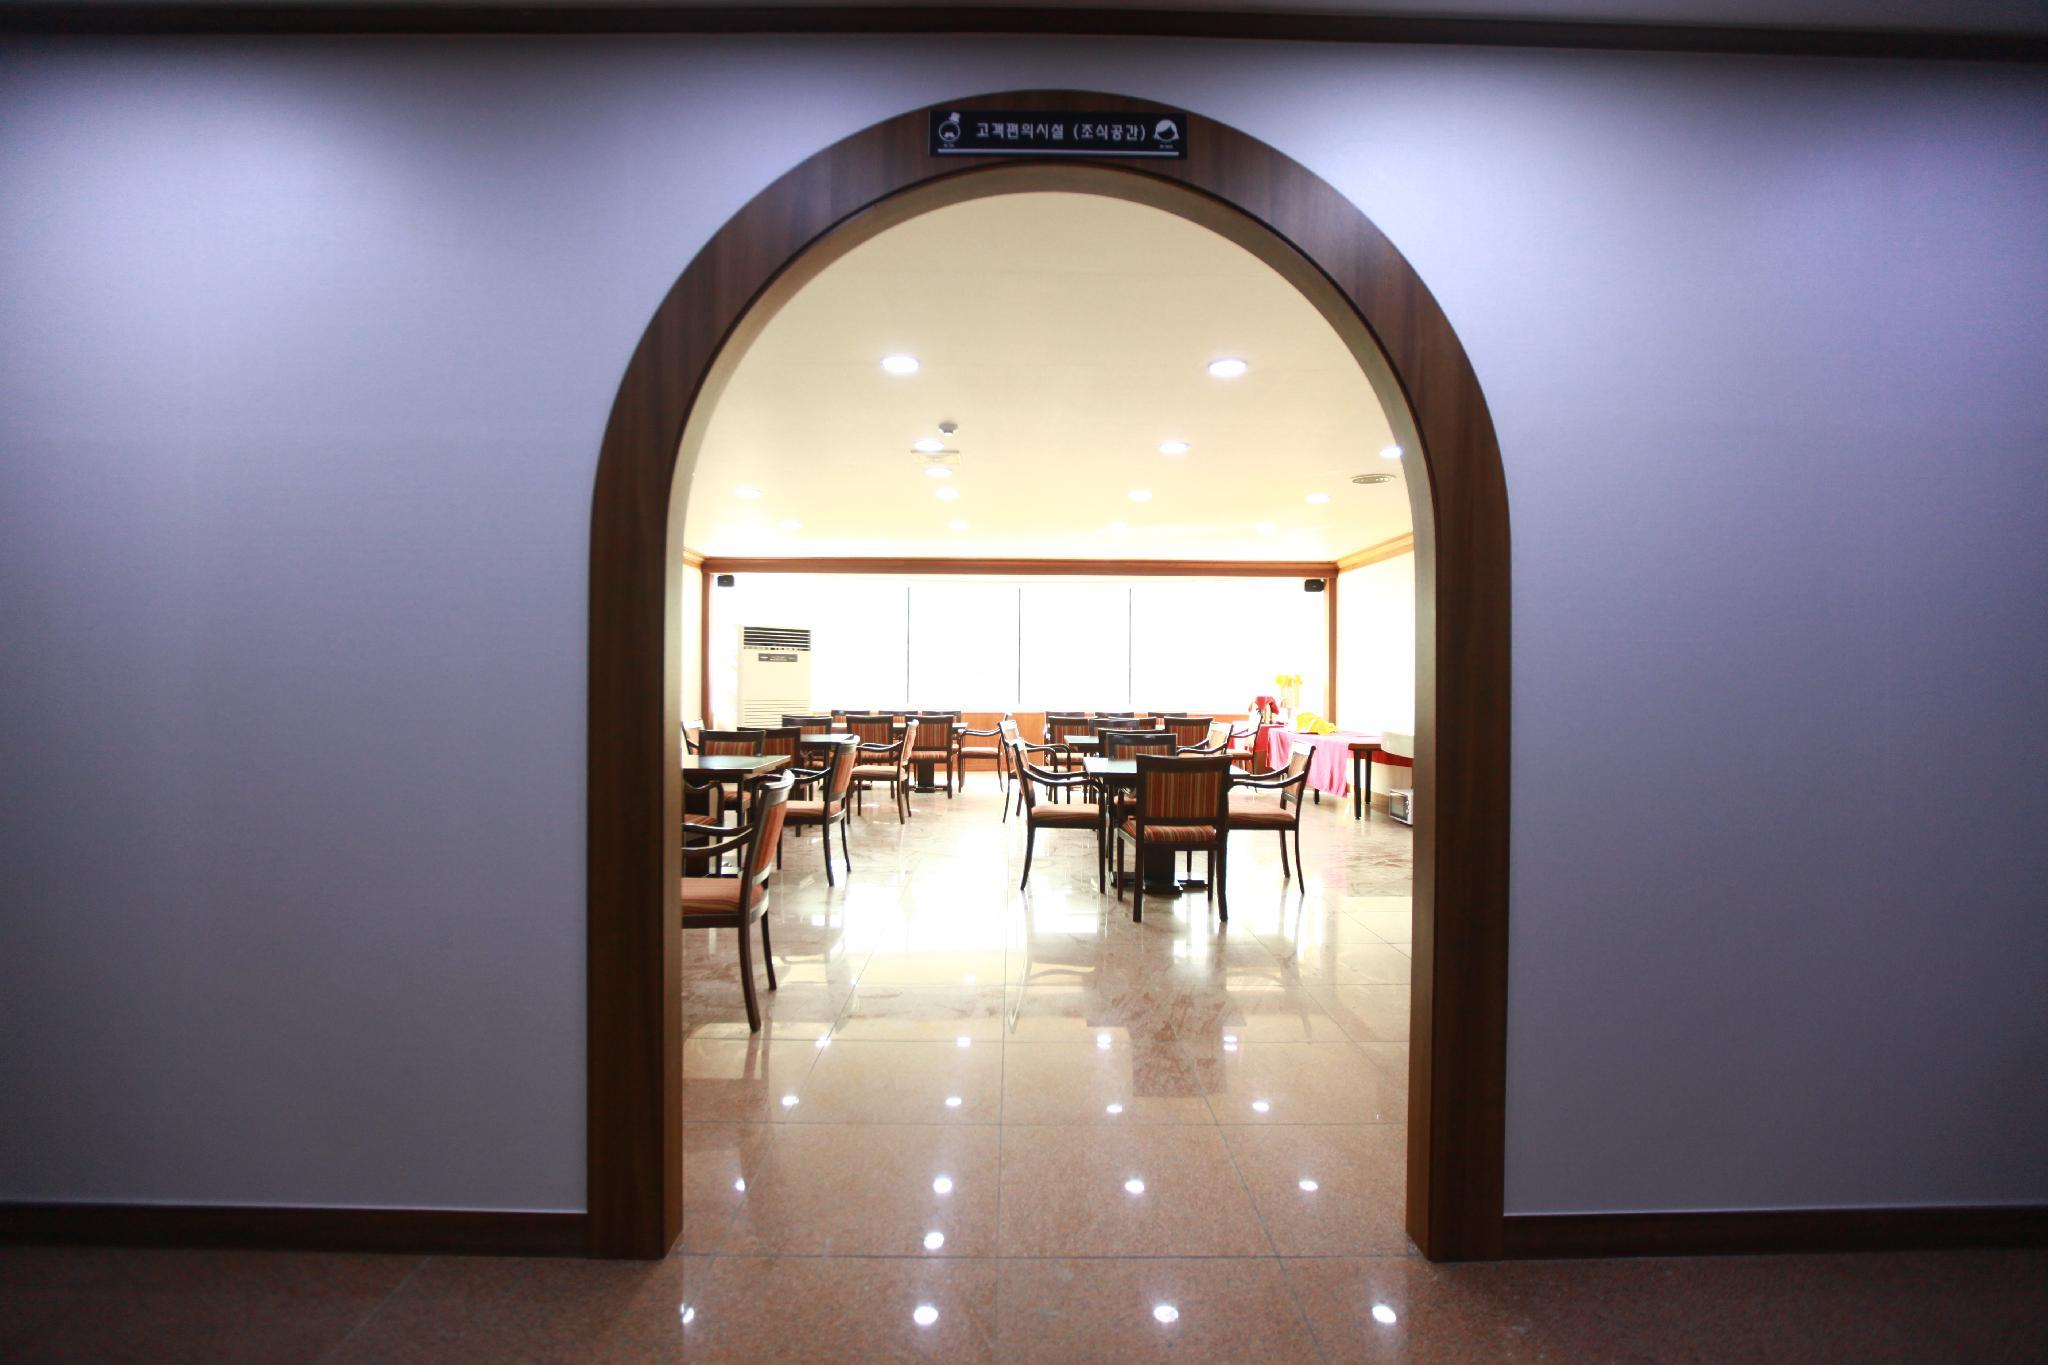 Ekonomy Hotel Gapyeong In Republic Of Korea